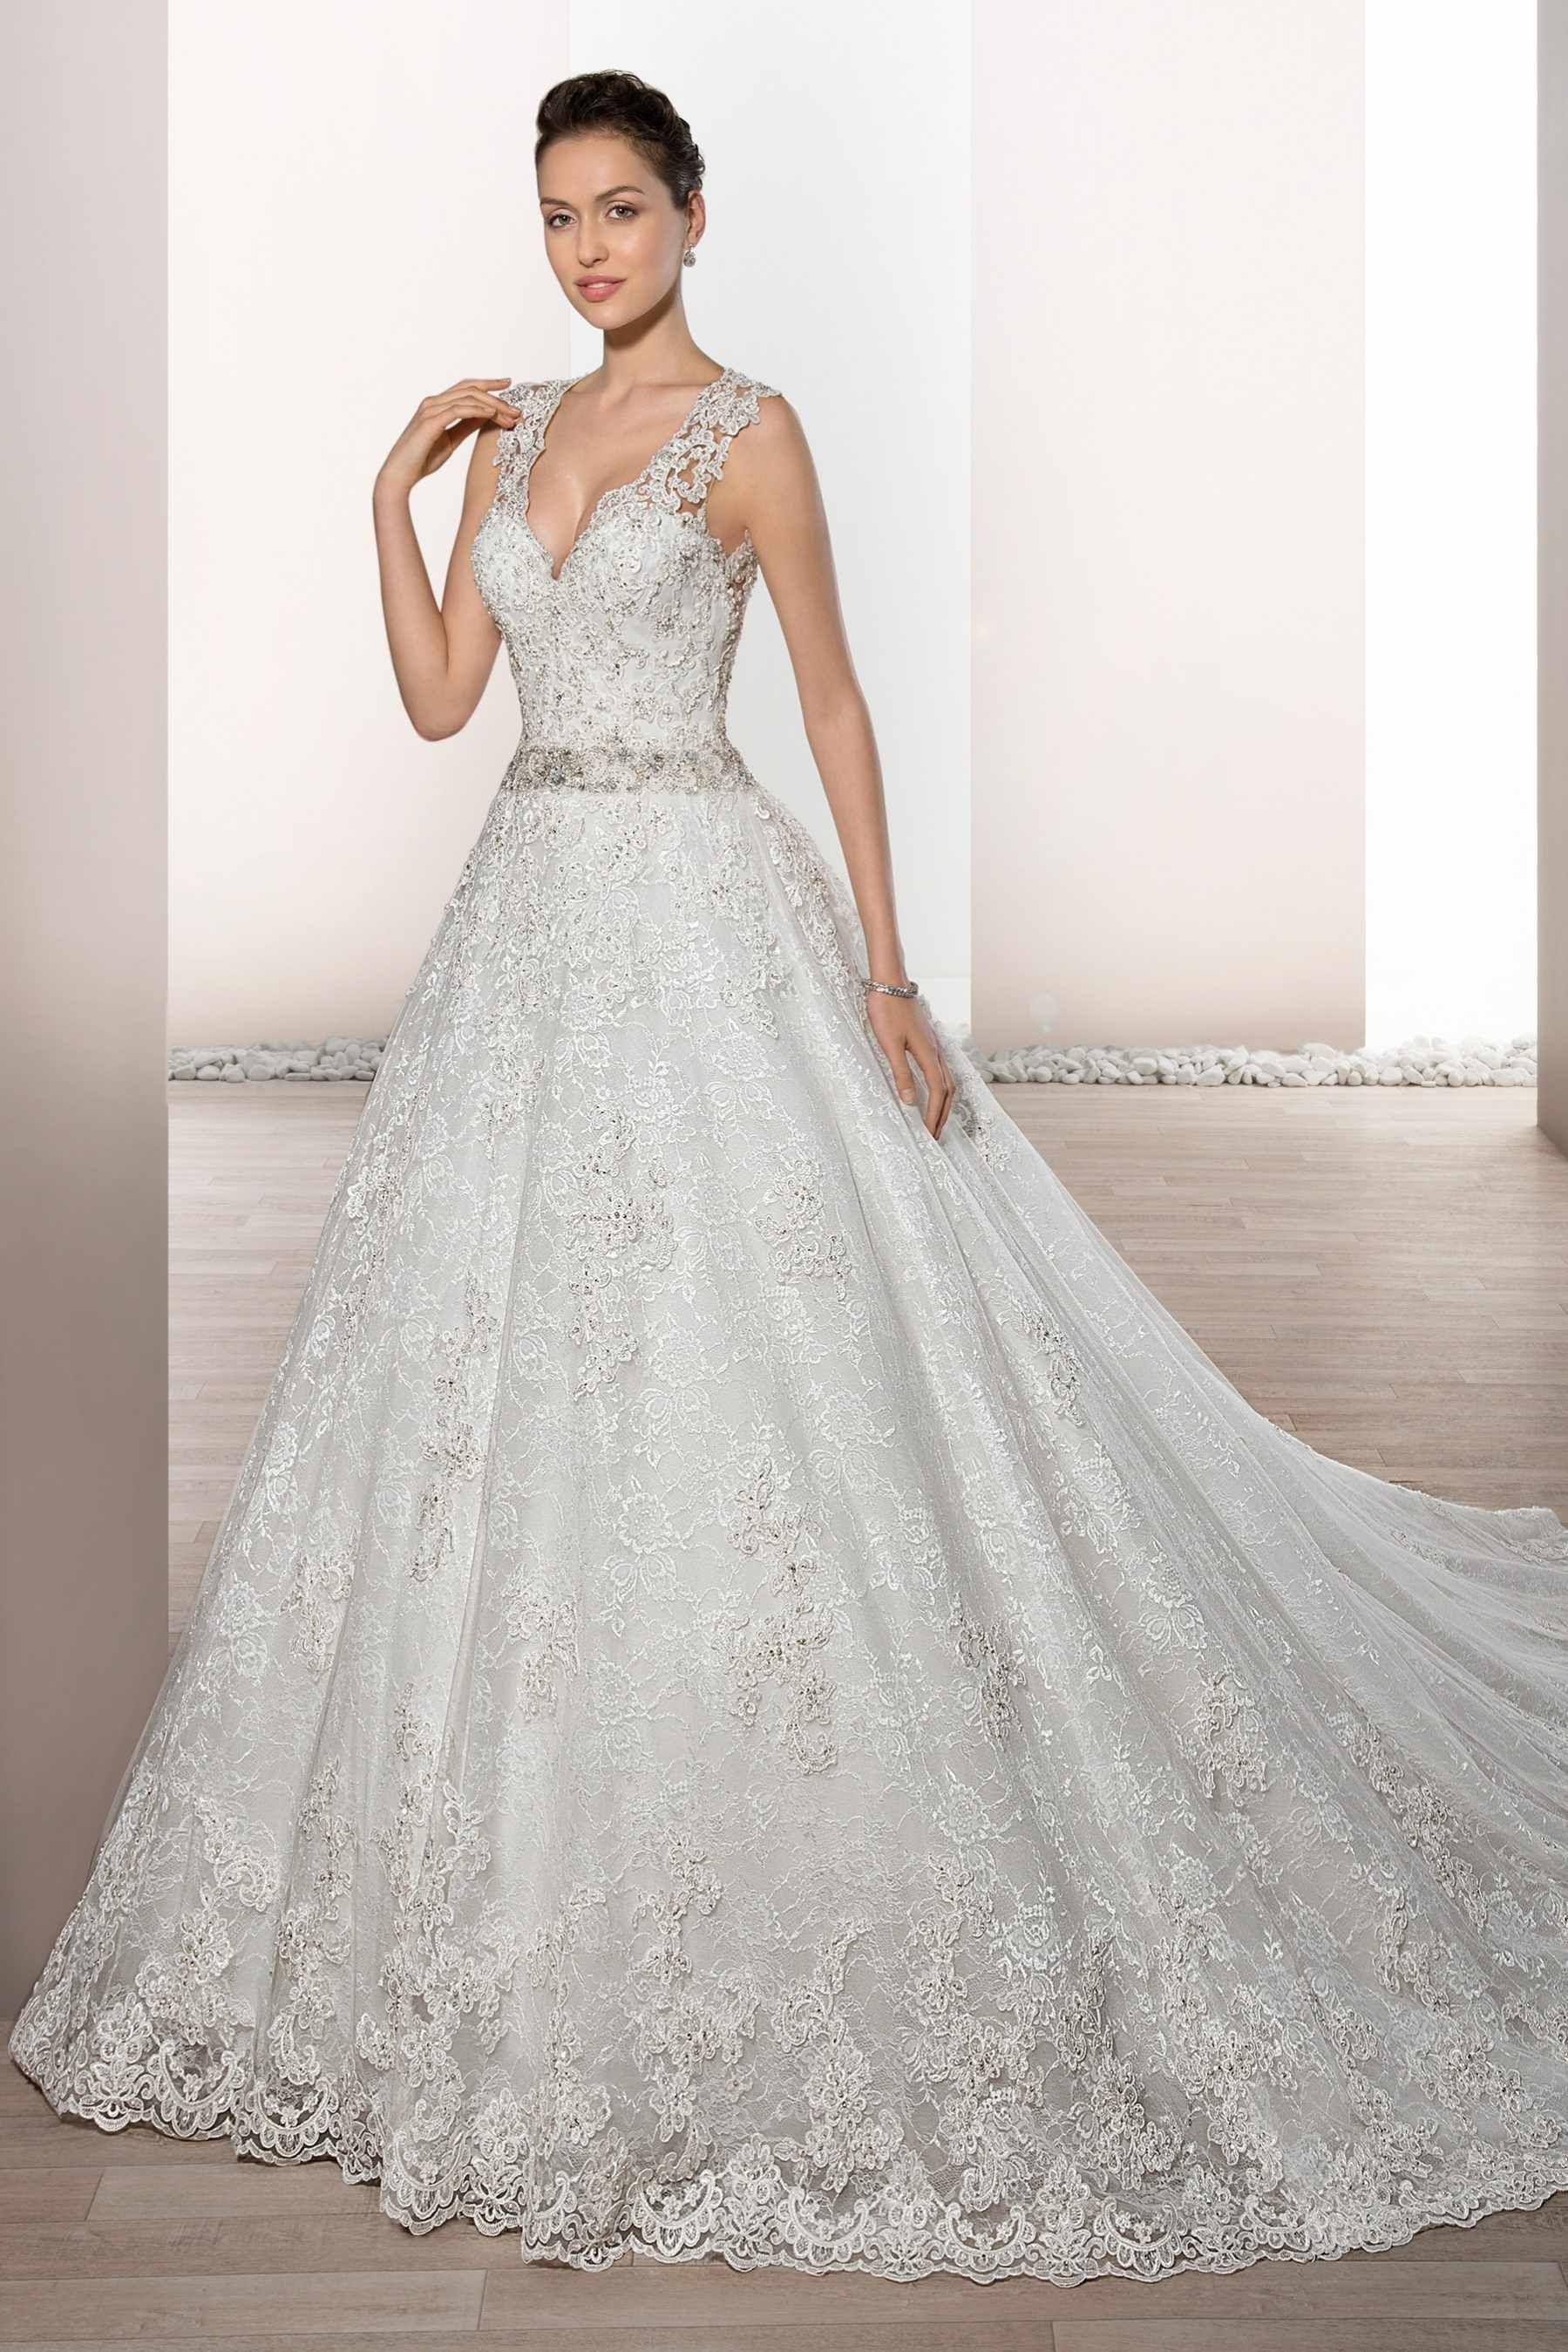 Demetrios wedding dress style an aline gown made foe the